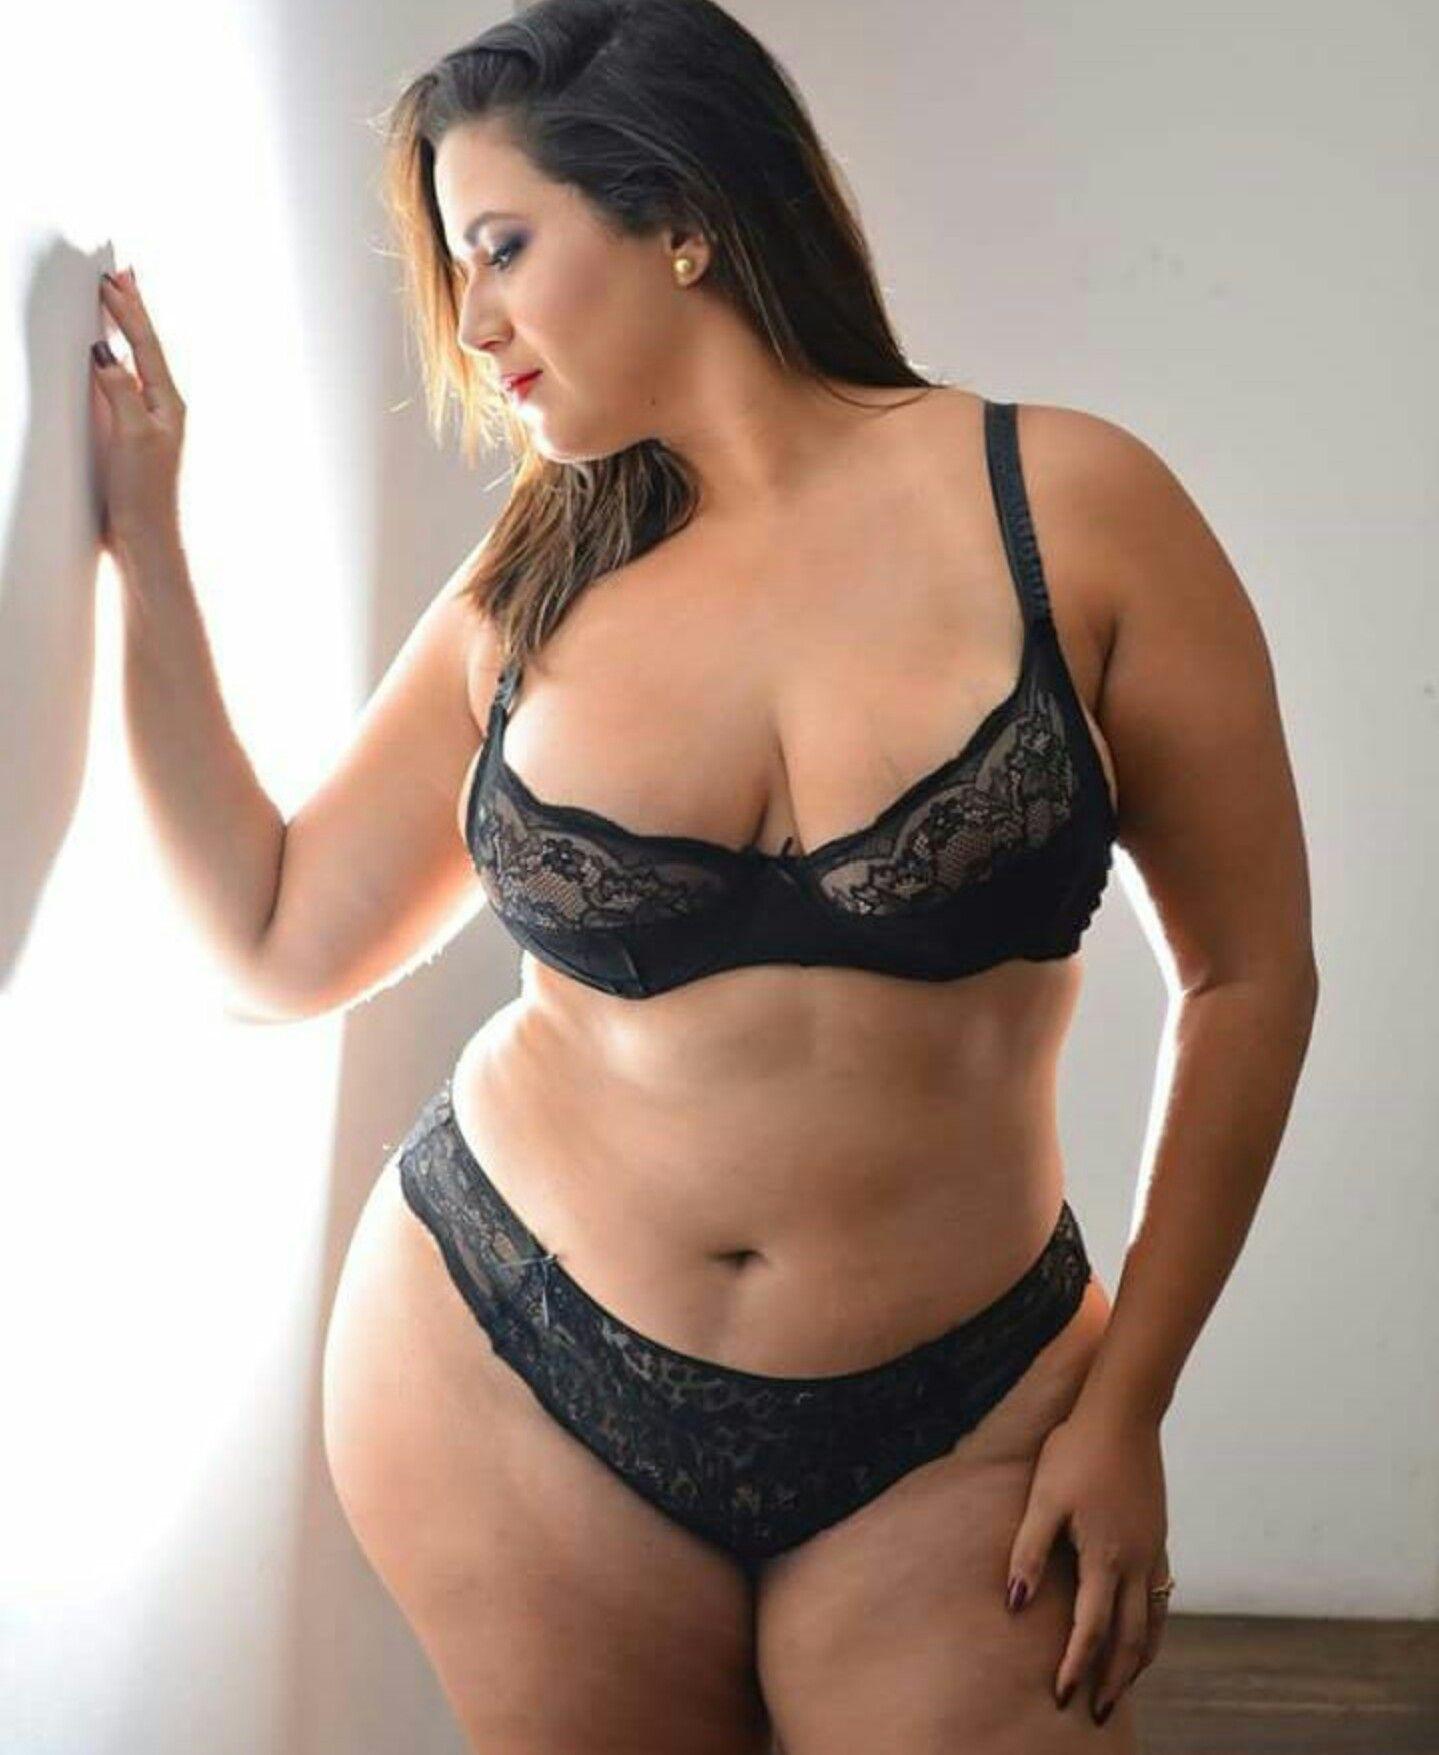 Bondage bound tits breasts boobs